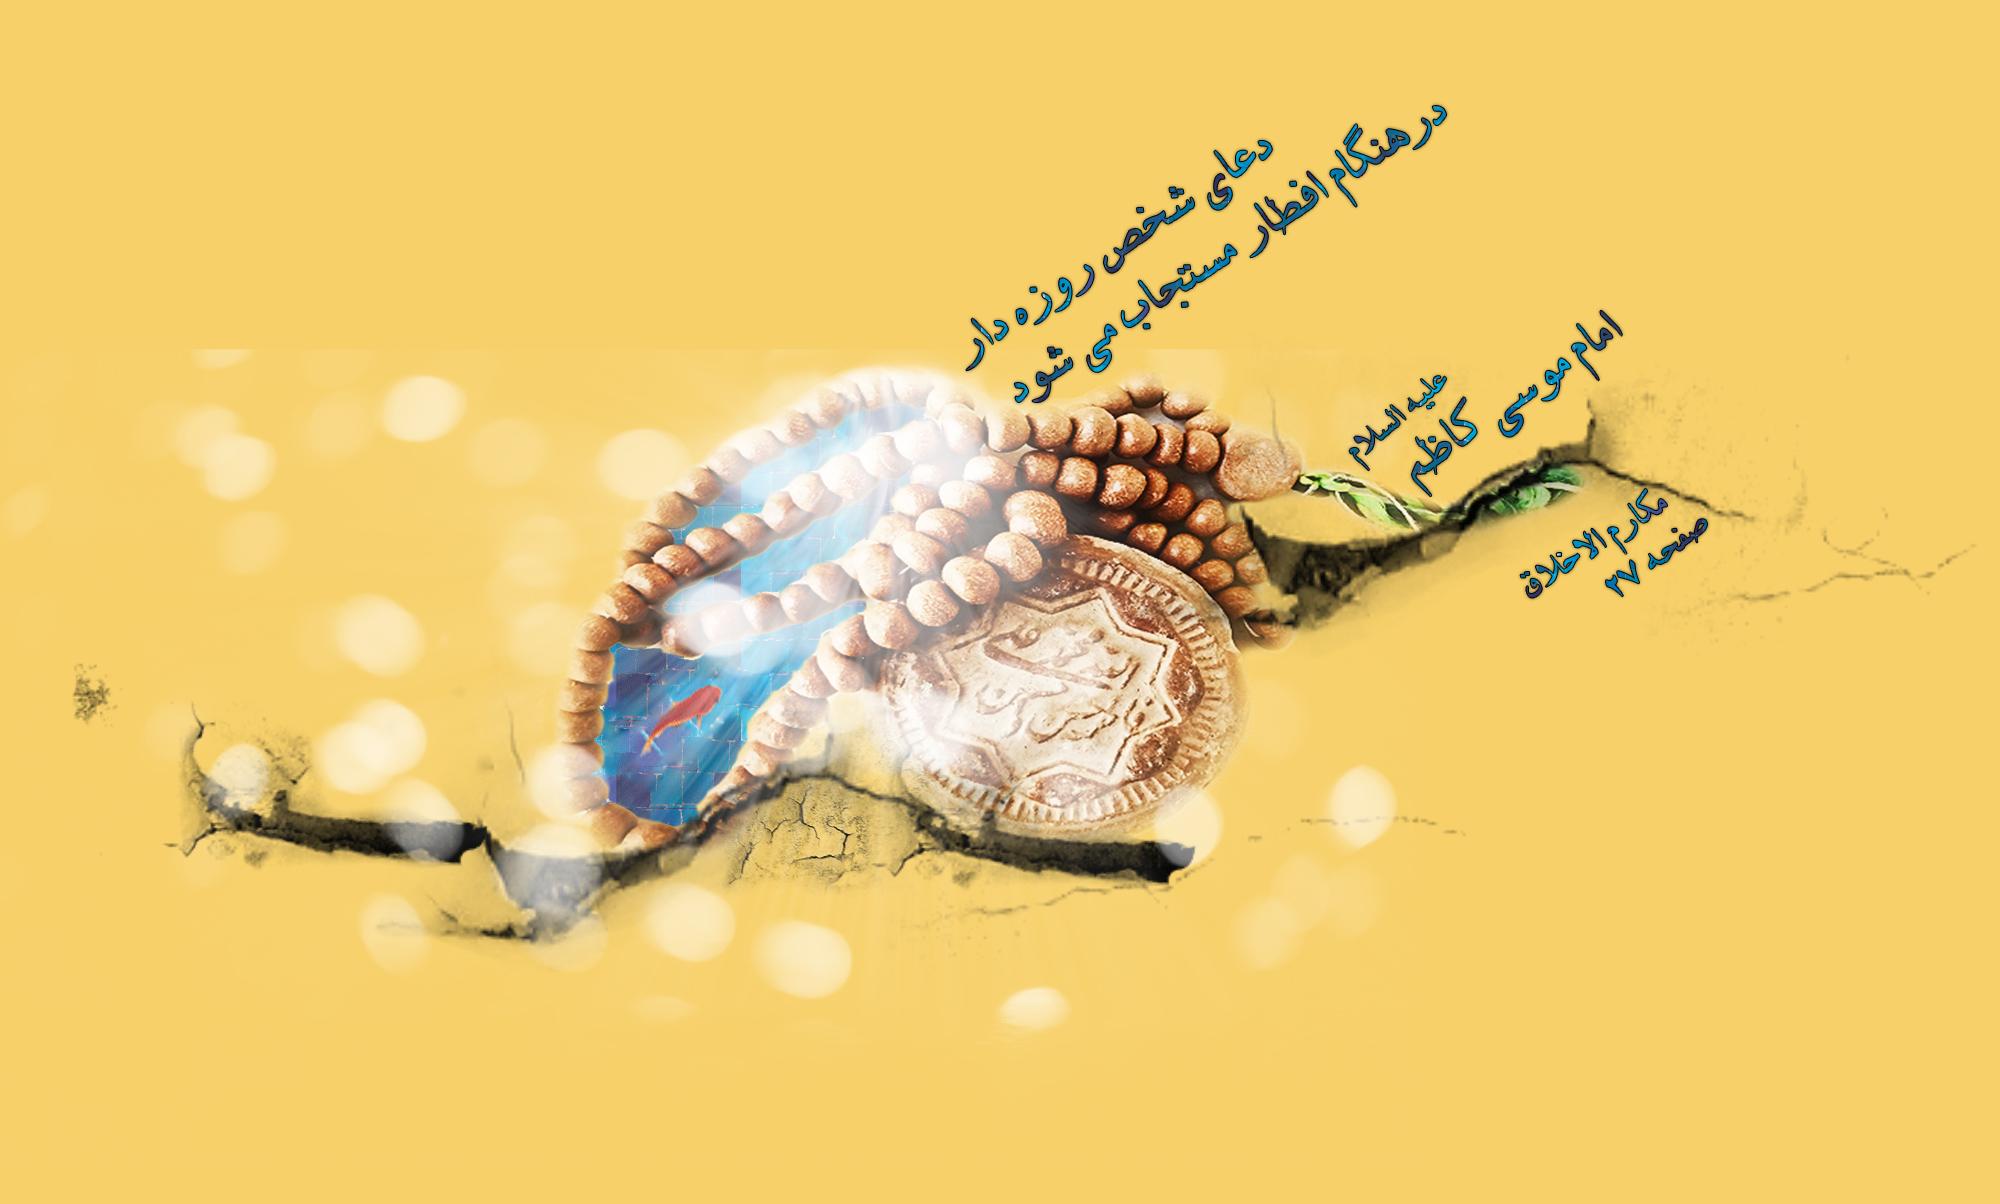 http://bayanbox.ir/view/8075579907650401041/p-r-1.jpg